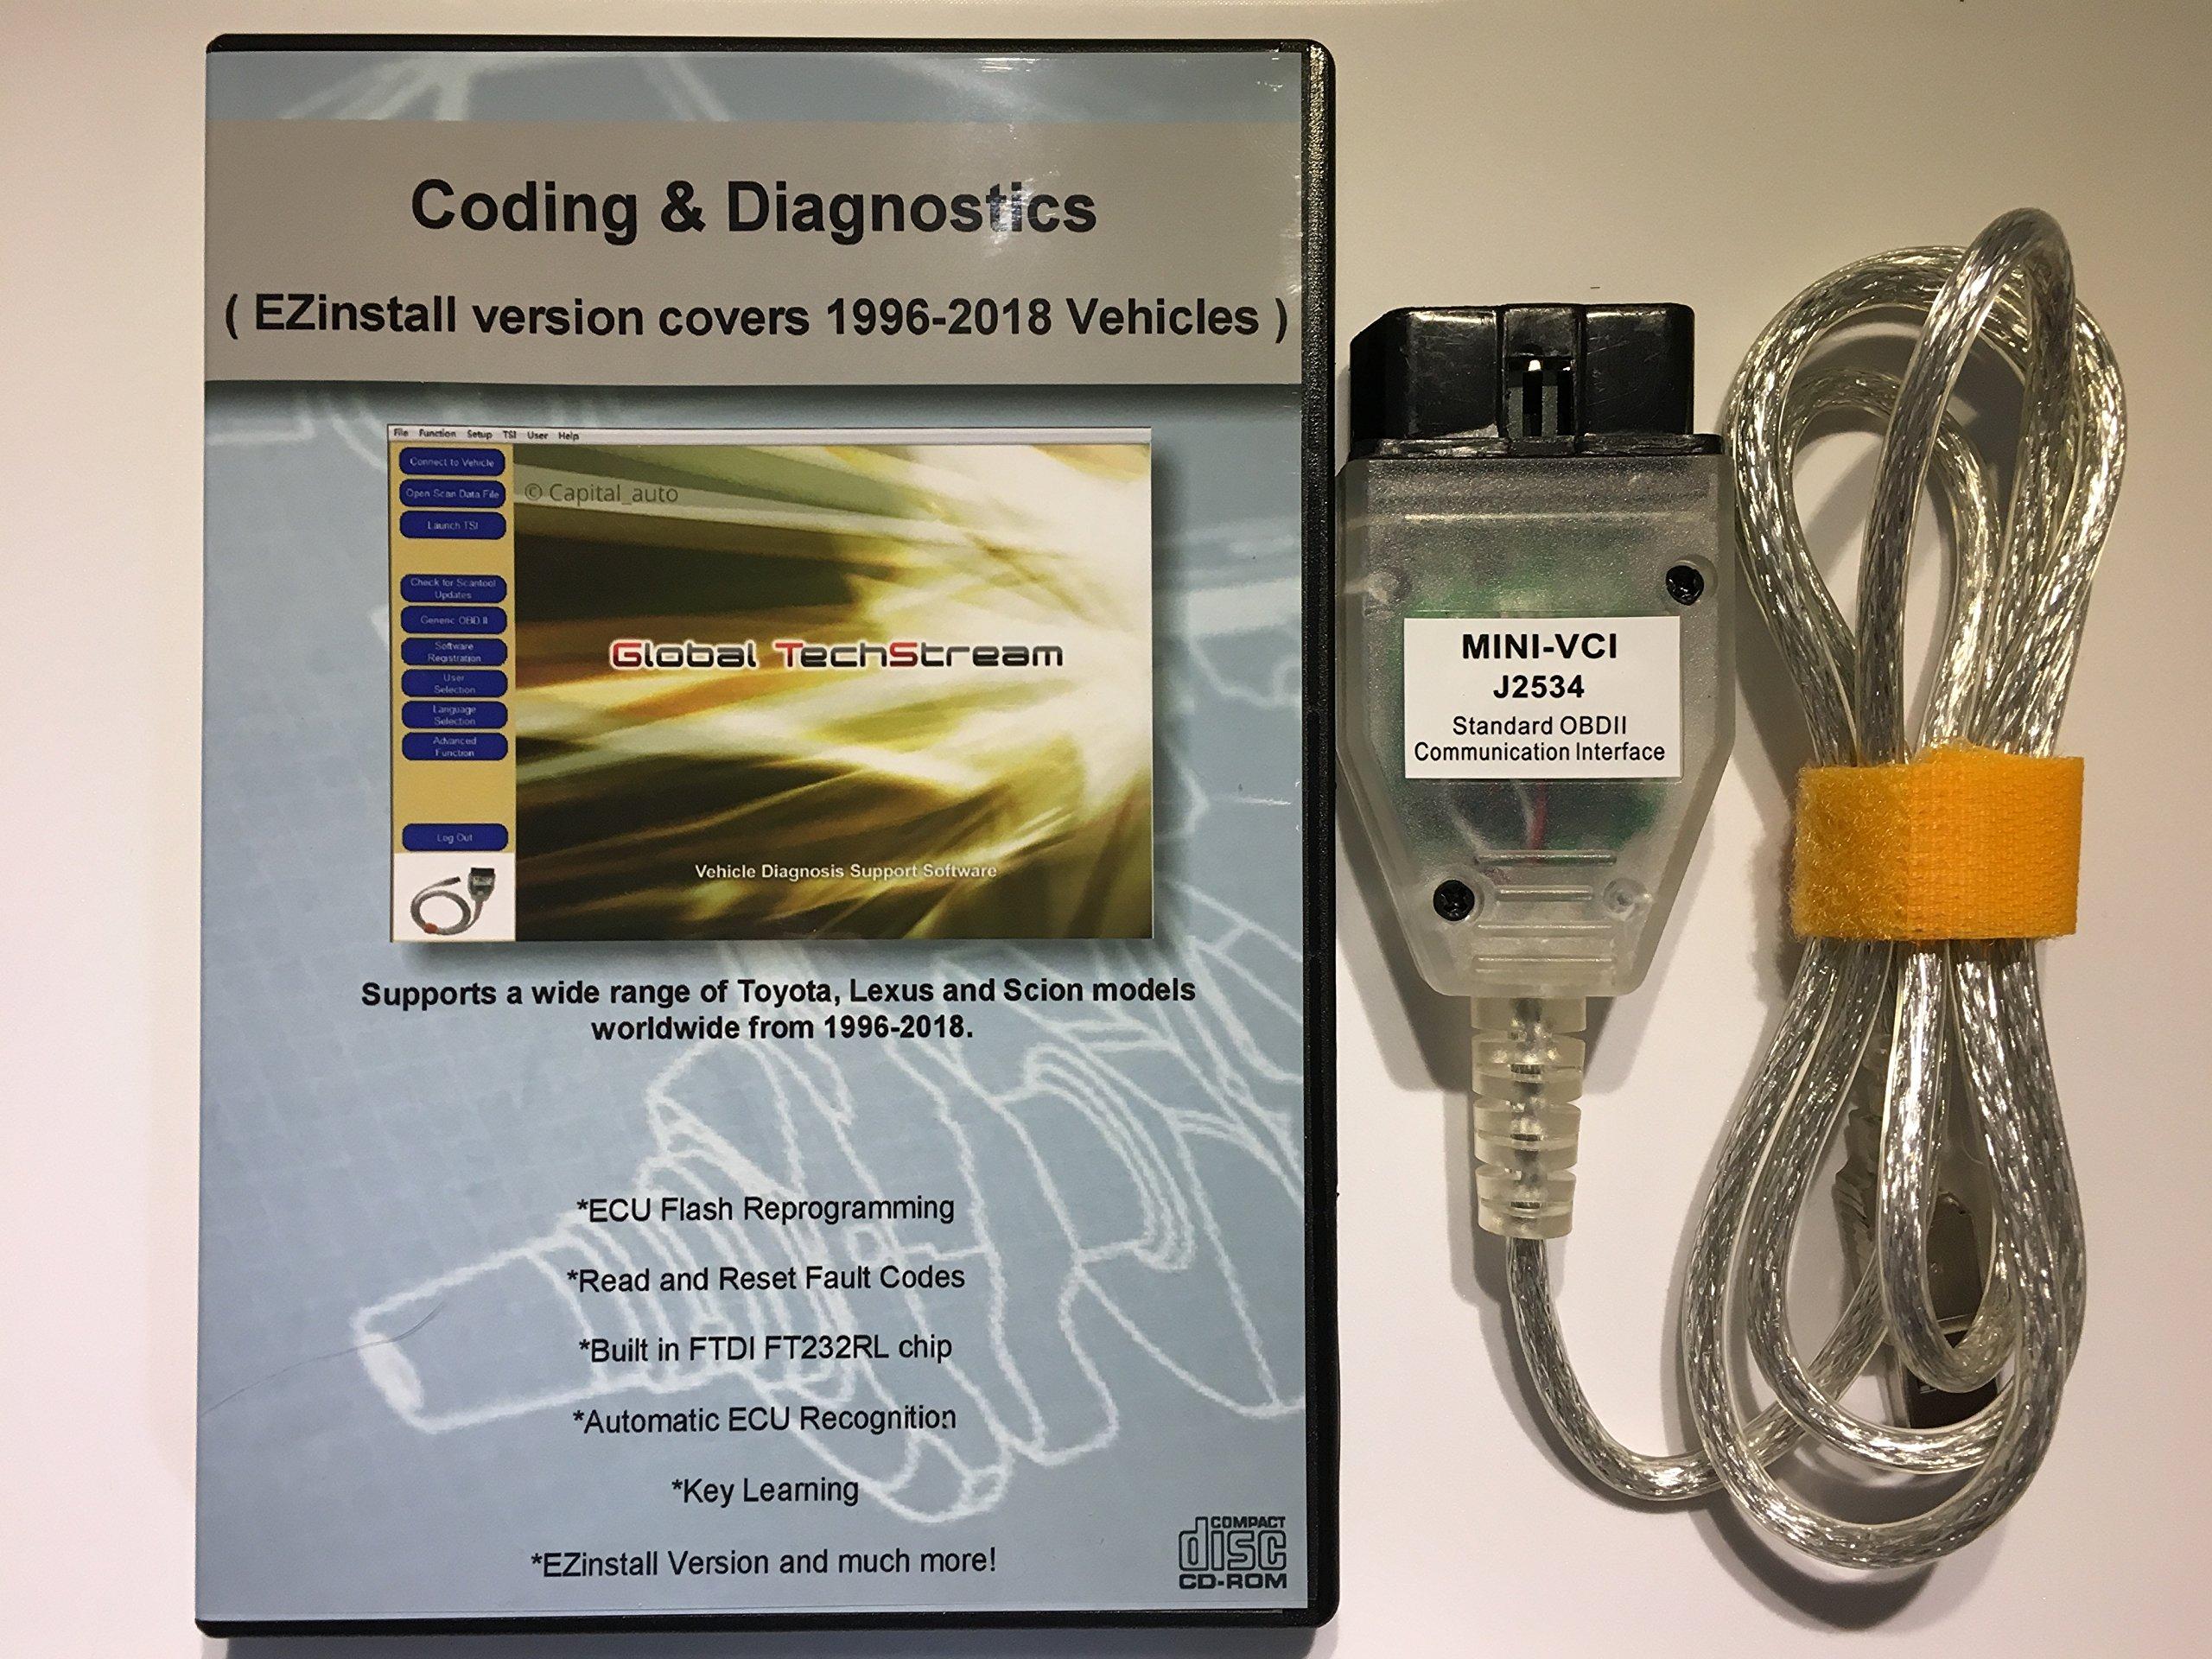 capital_auto Mini VCI J2534 Diagnostic Cable for Toyota